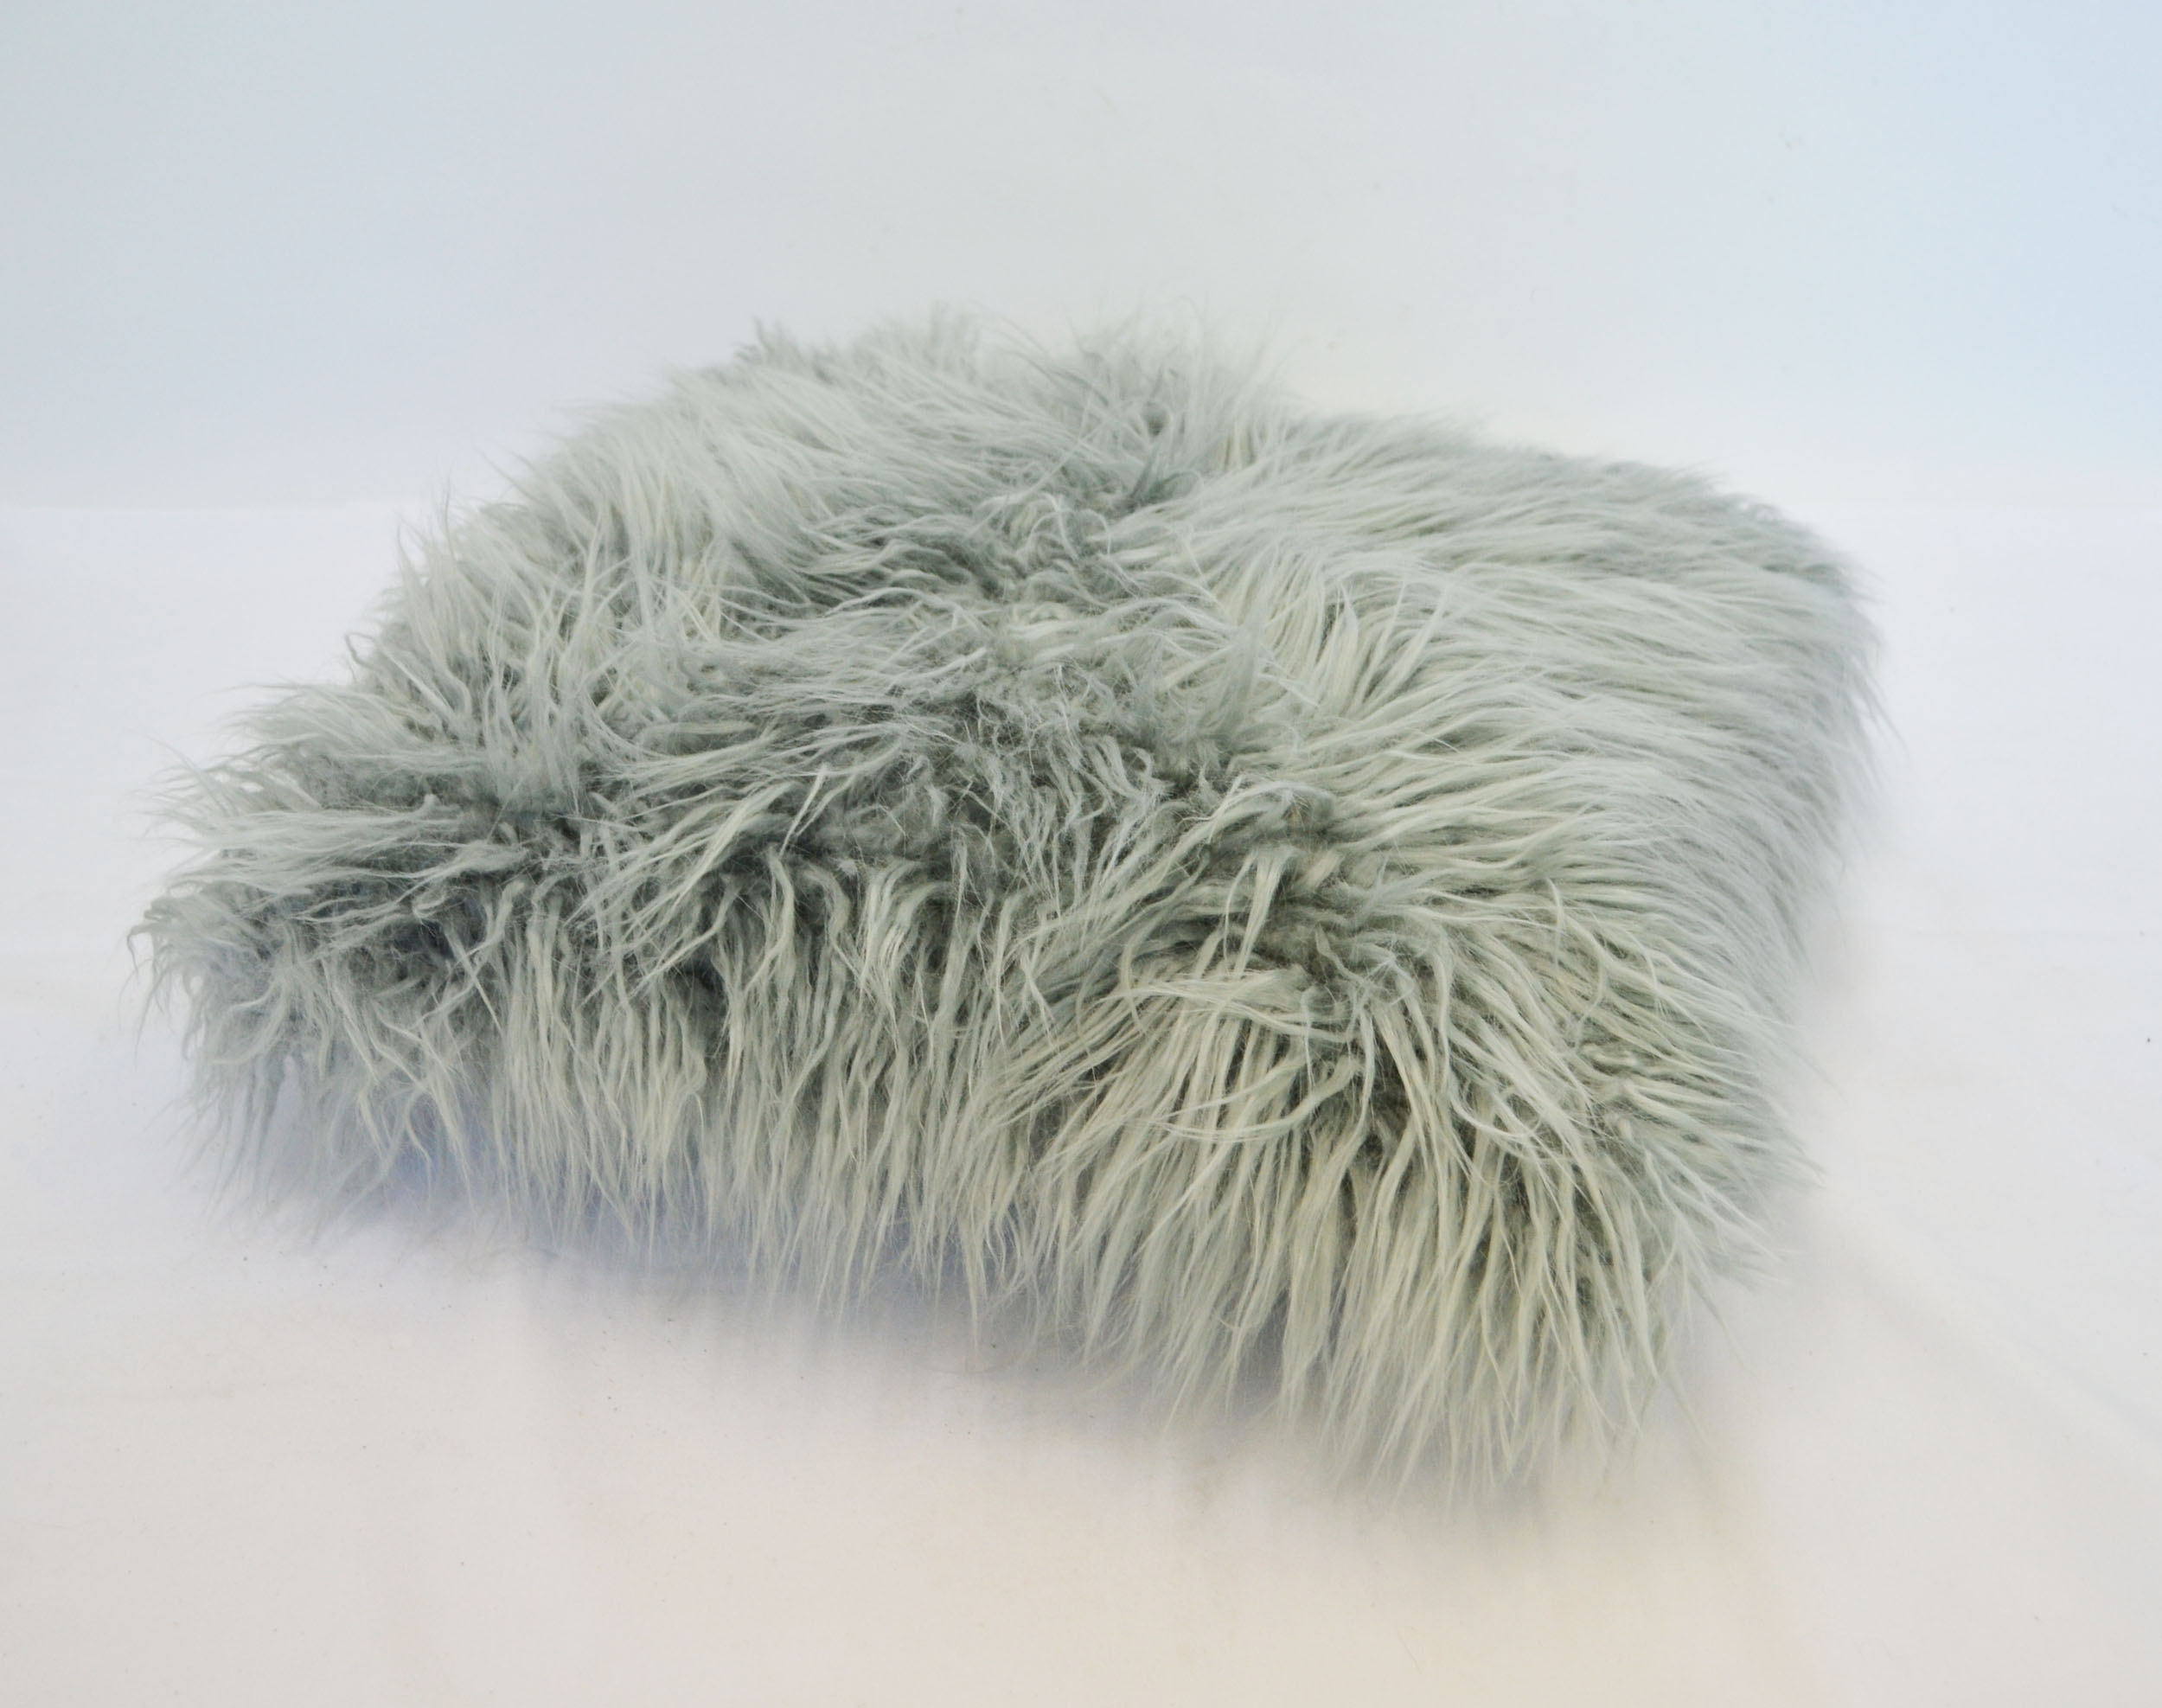 grey shag pillow   Quantity: 1  Price: $10.00